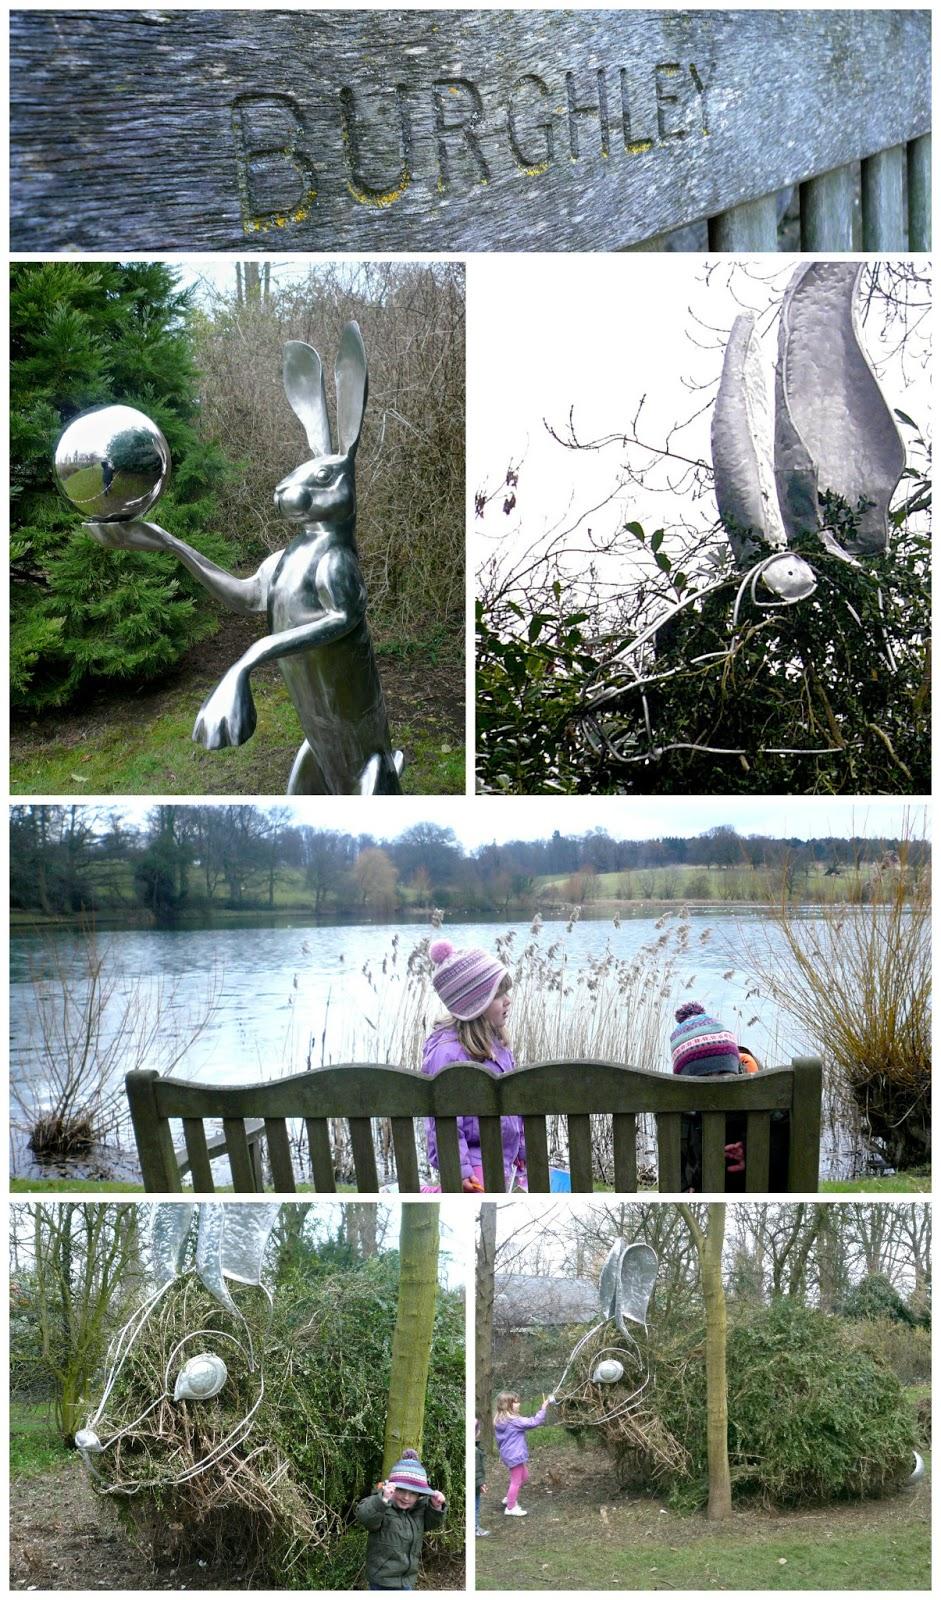 Burghley Sculpture Gardens